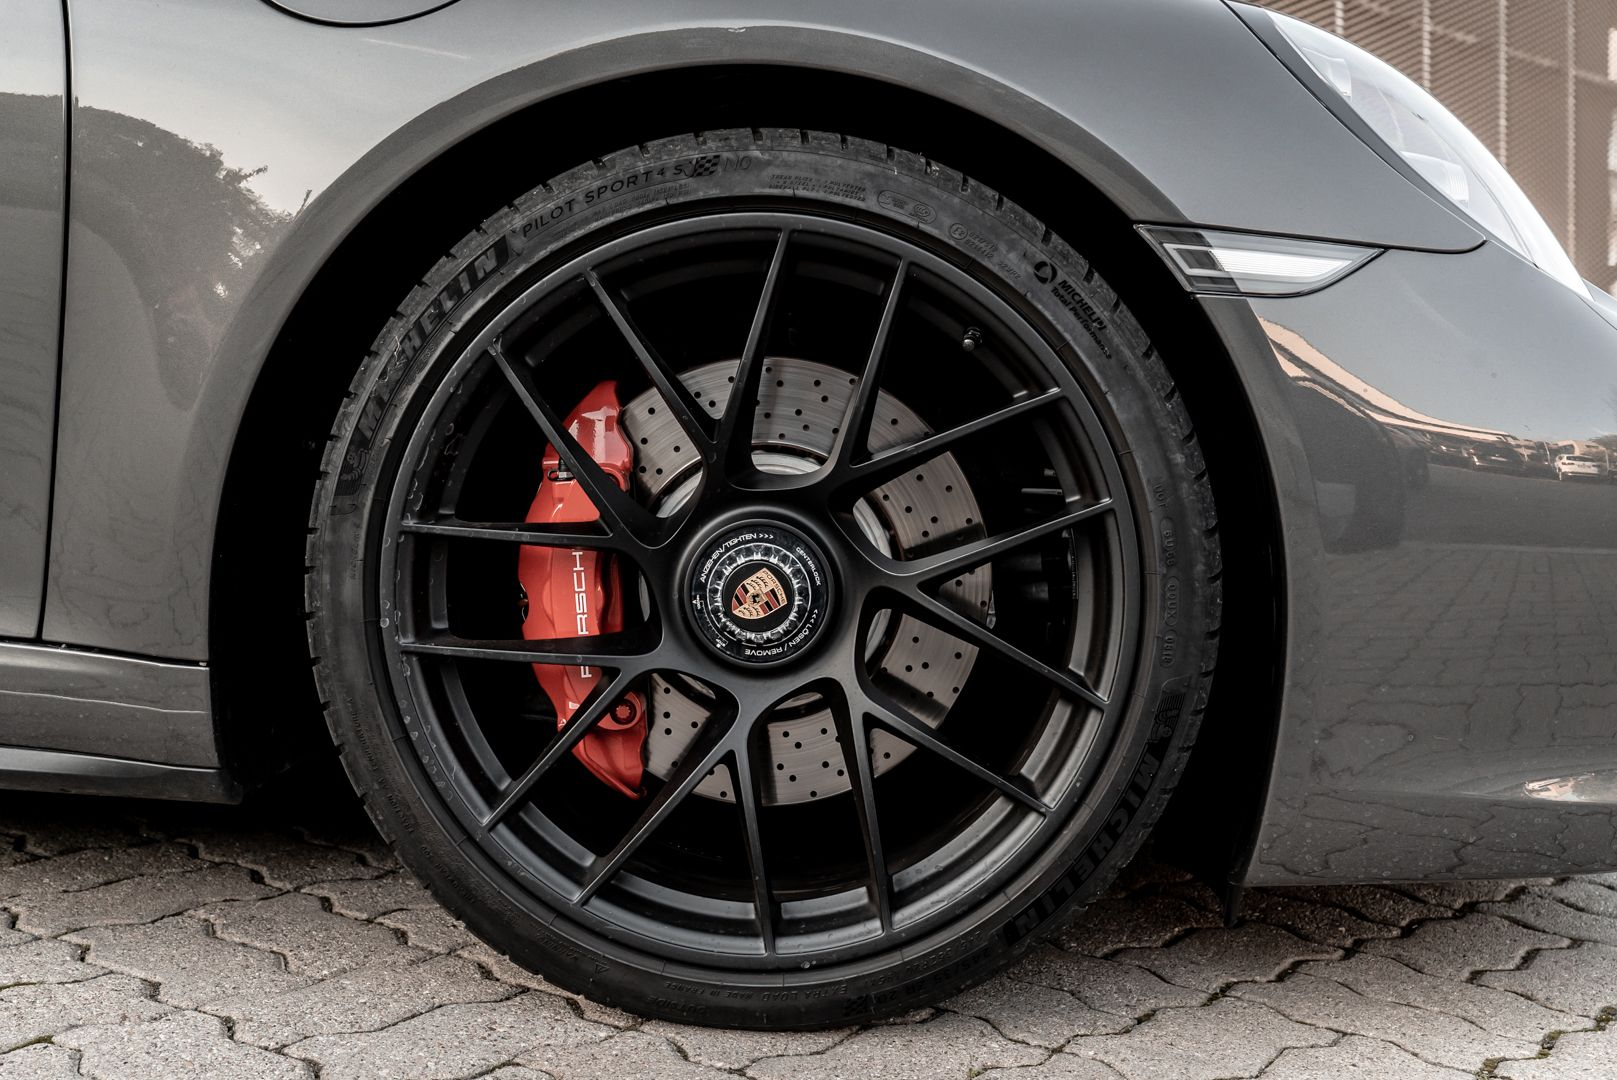 2018 Porsche 911 Targa 4 GTS 85279